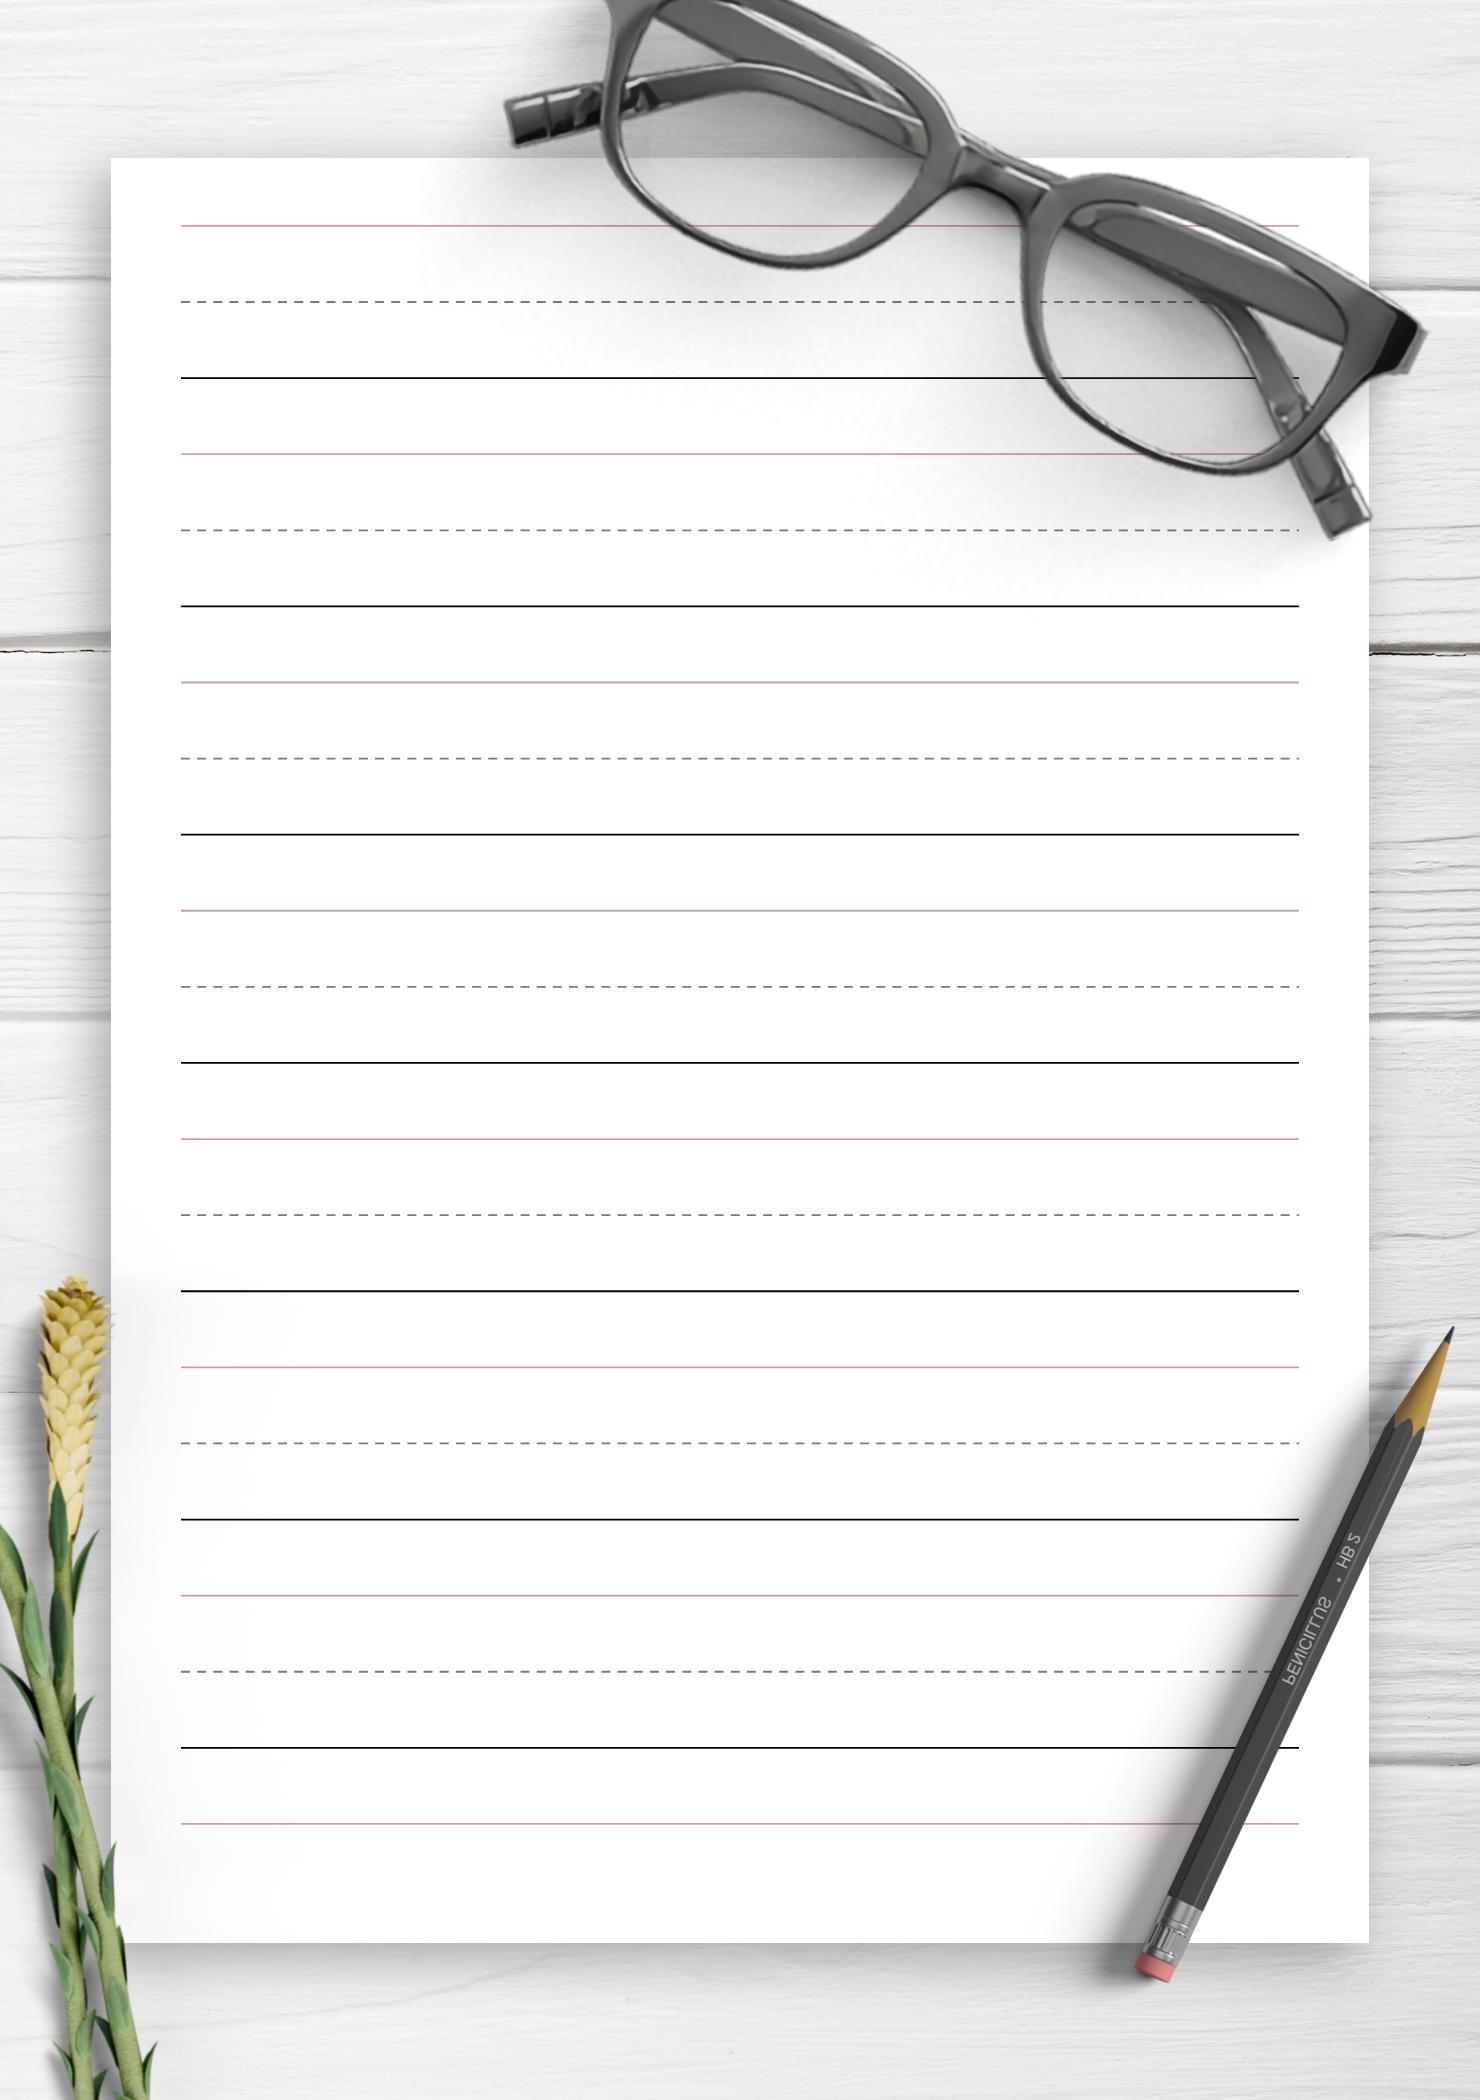 graphic regarding Printable Handwriting Paper identified as Free of charge Printable 1 inch Rule Handwriting Paper PDF Down load